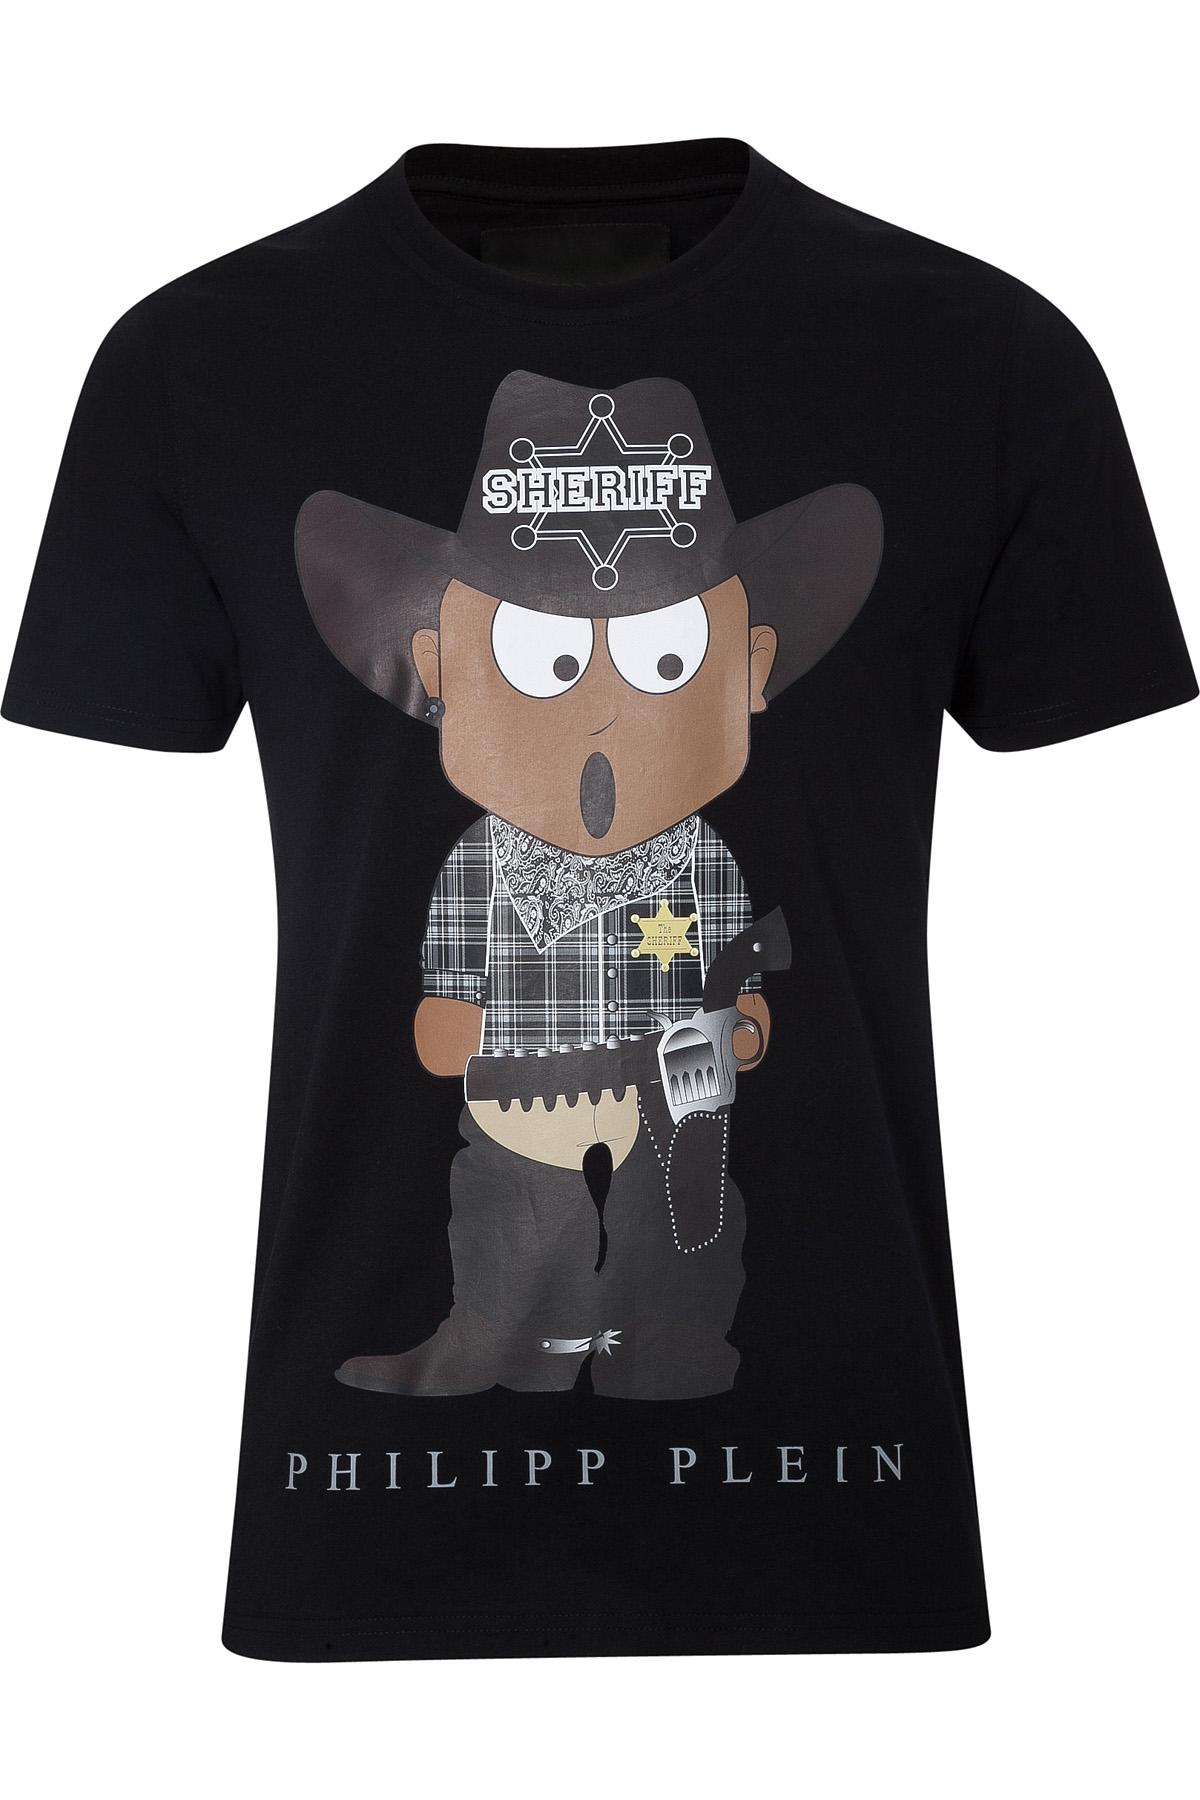 philipp plein t shirt modelleri maslak outlet blog. Black Bedroom Furniture Sets. Home Design Ideas